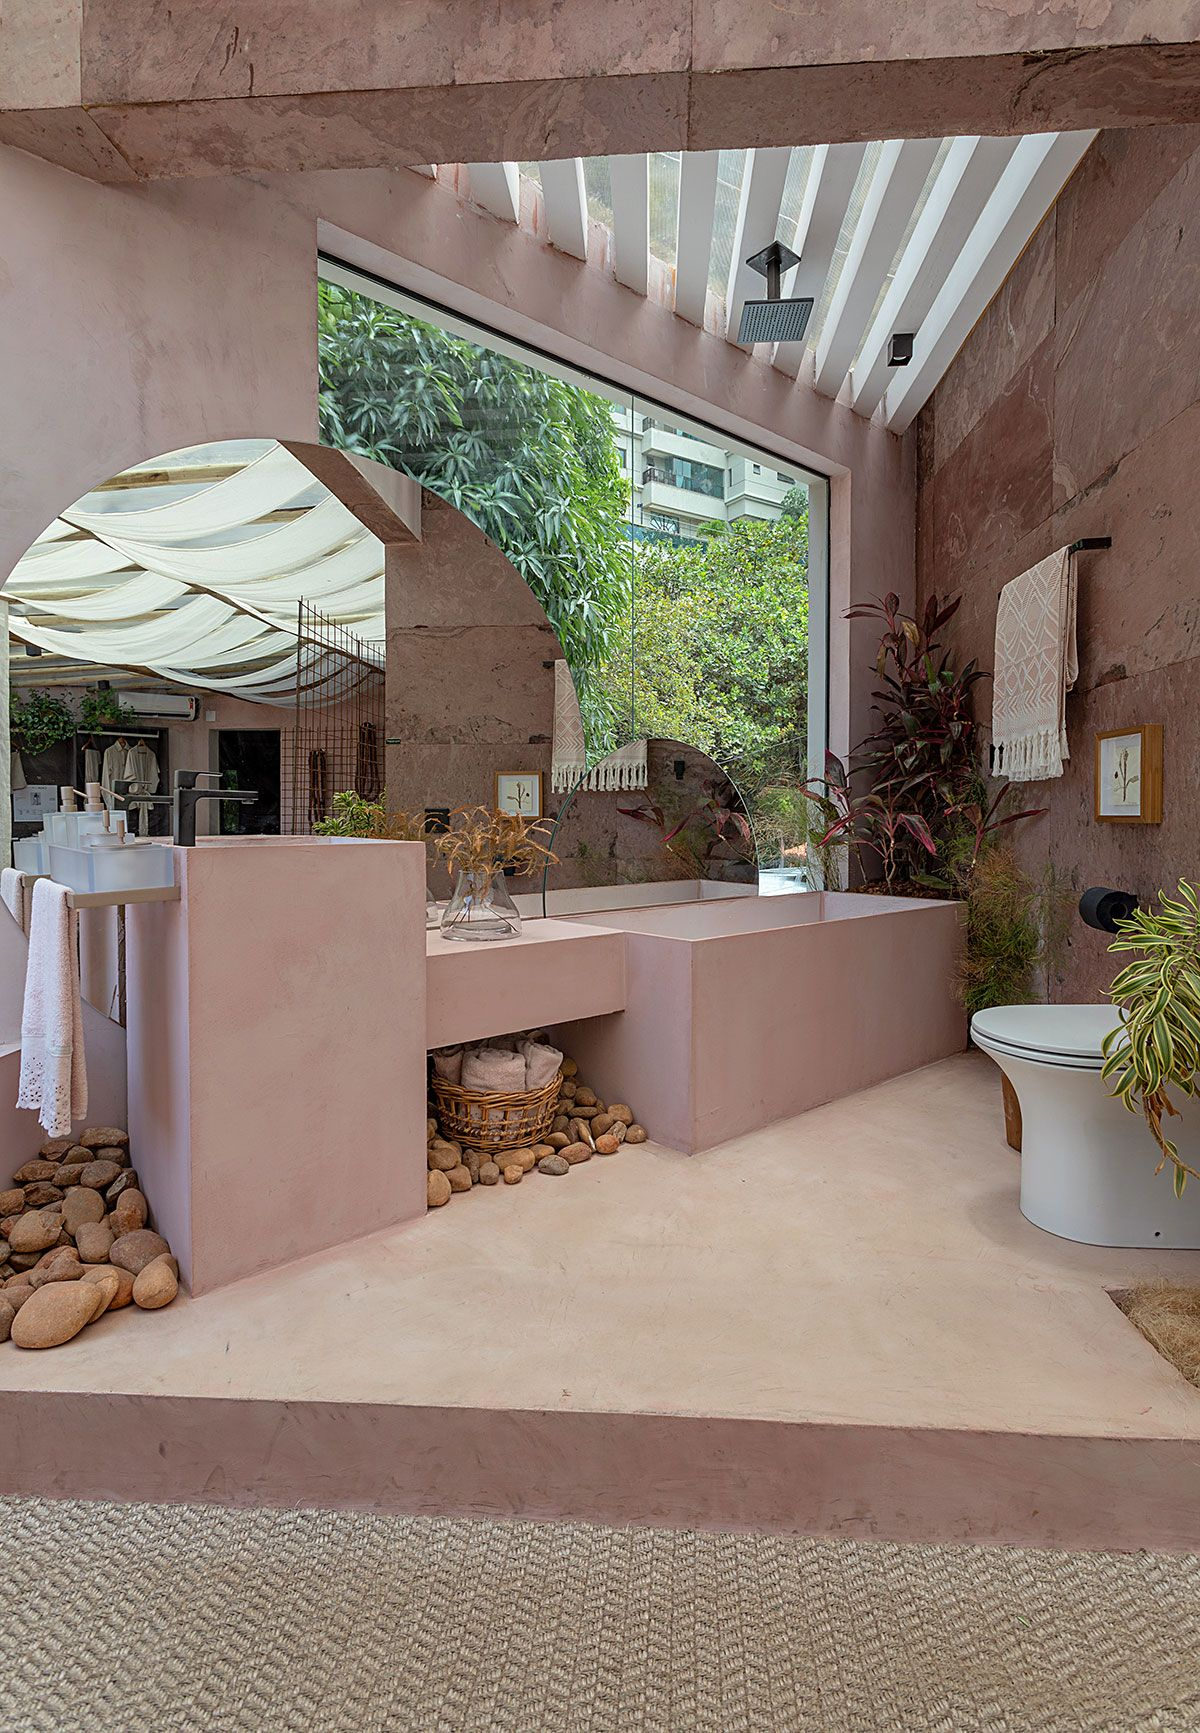 banheiro monocromatico jessica araujo casacor bahia 2019 colorido